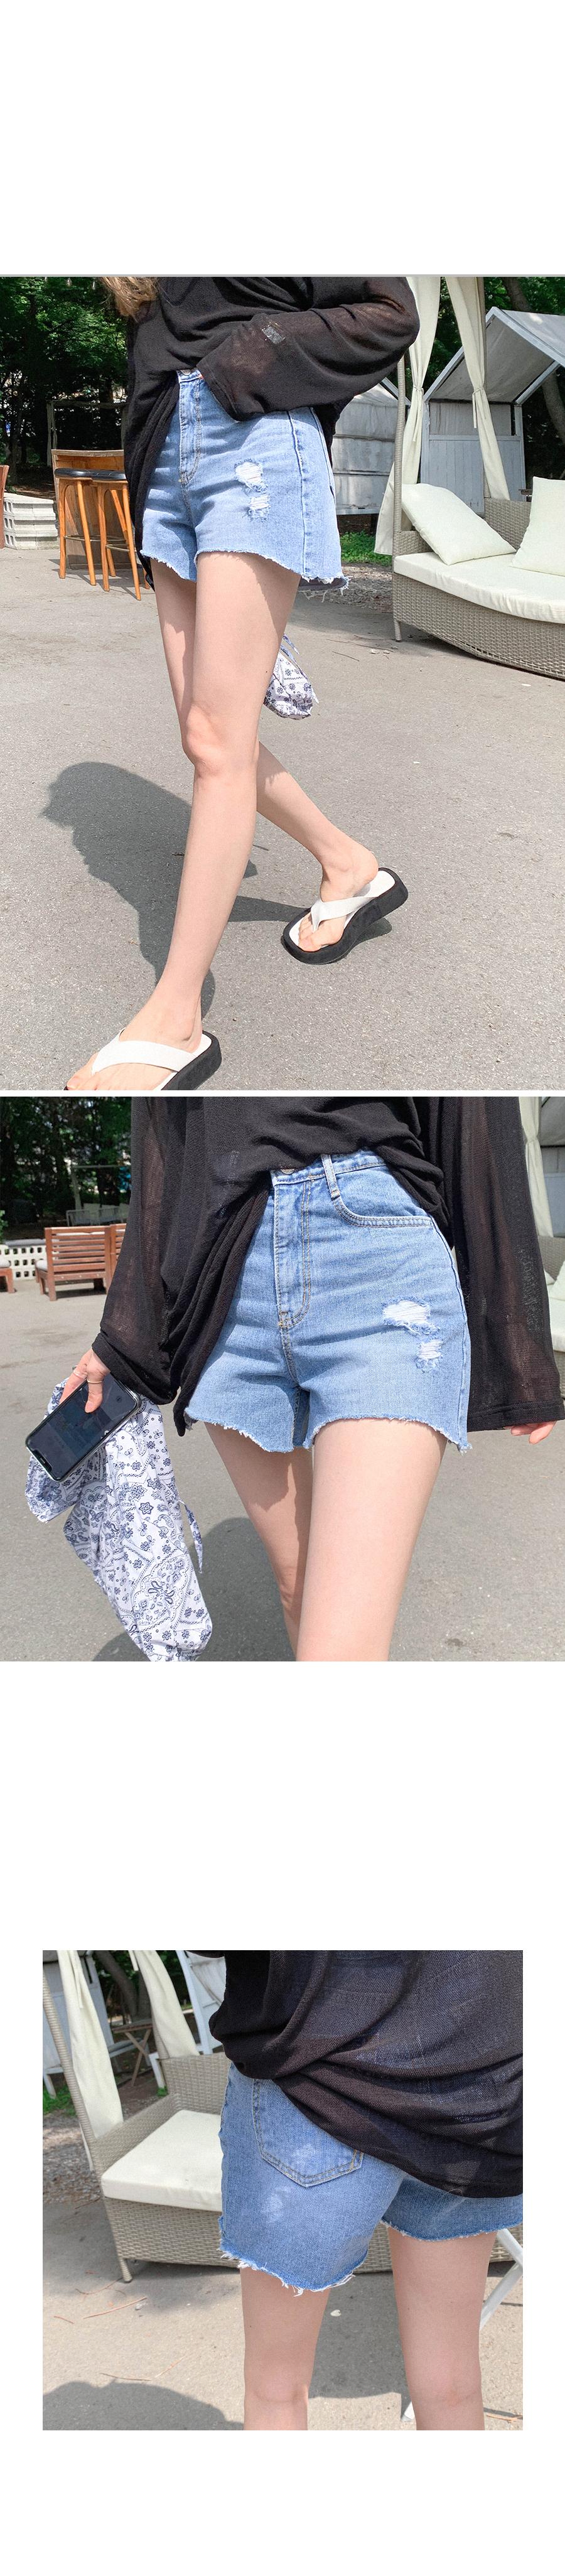 Rounding cut denim shorts